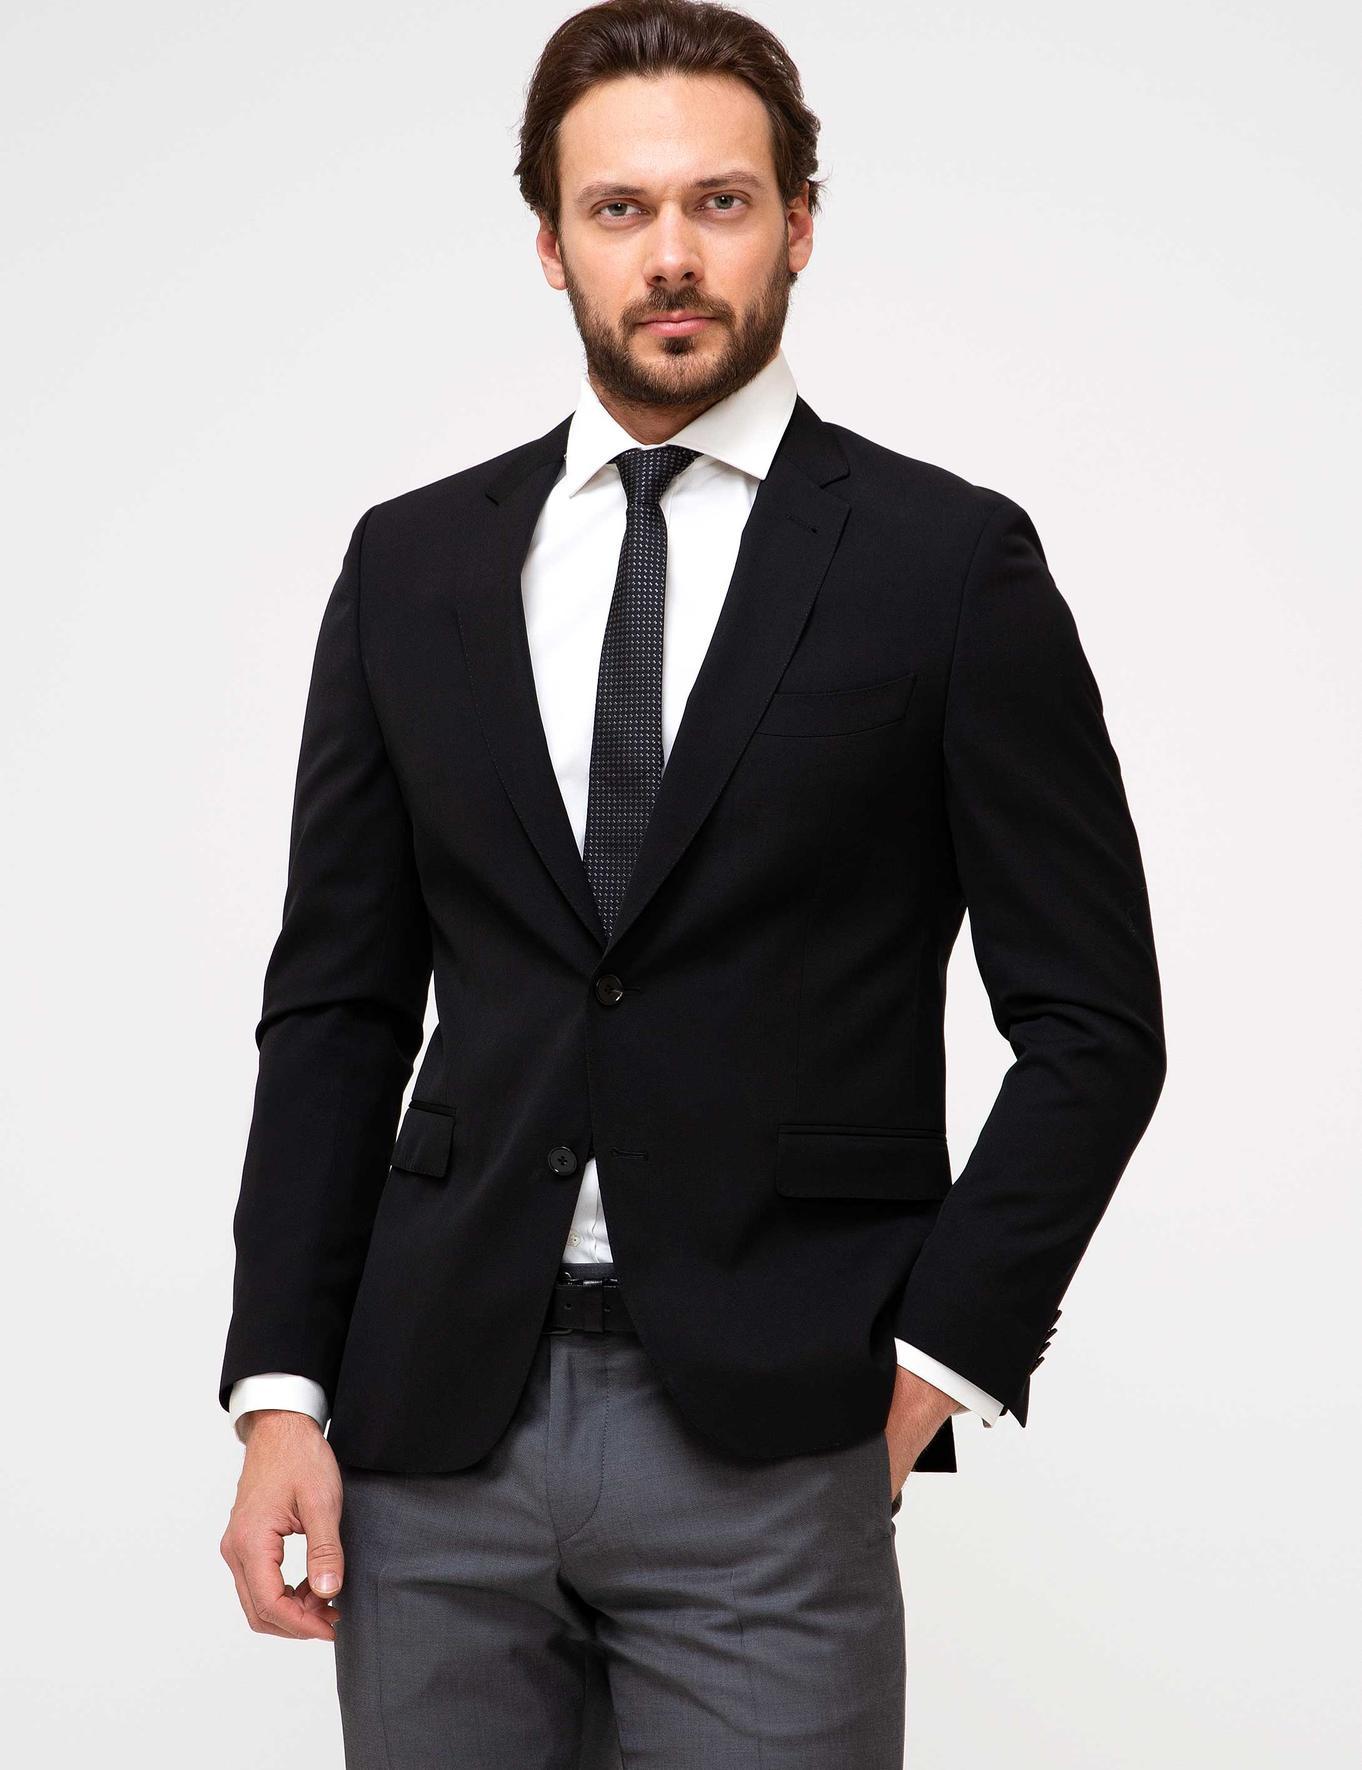 Siyah Slim Fit Ceket - 50197244008